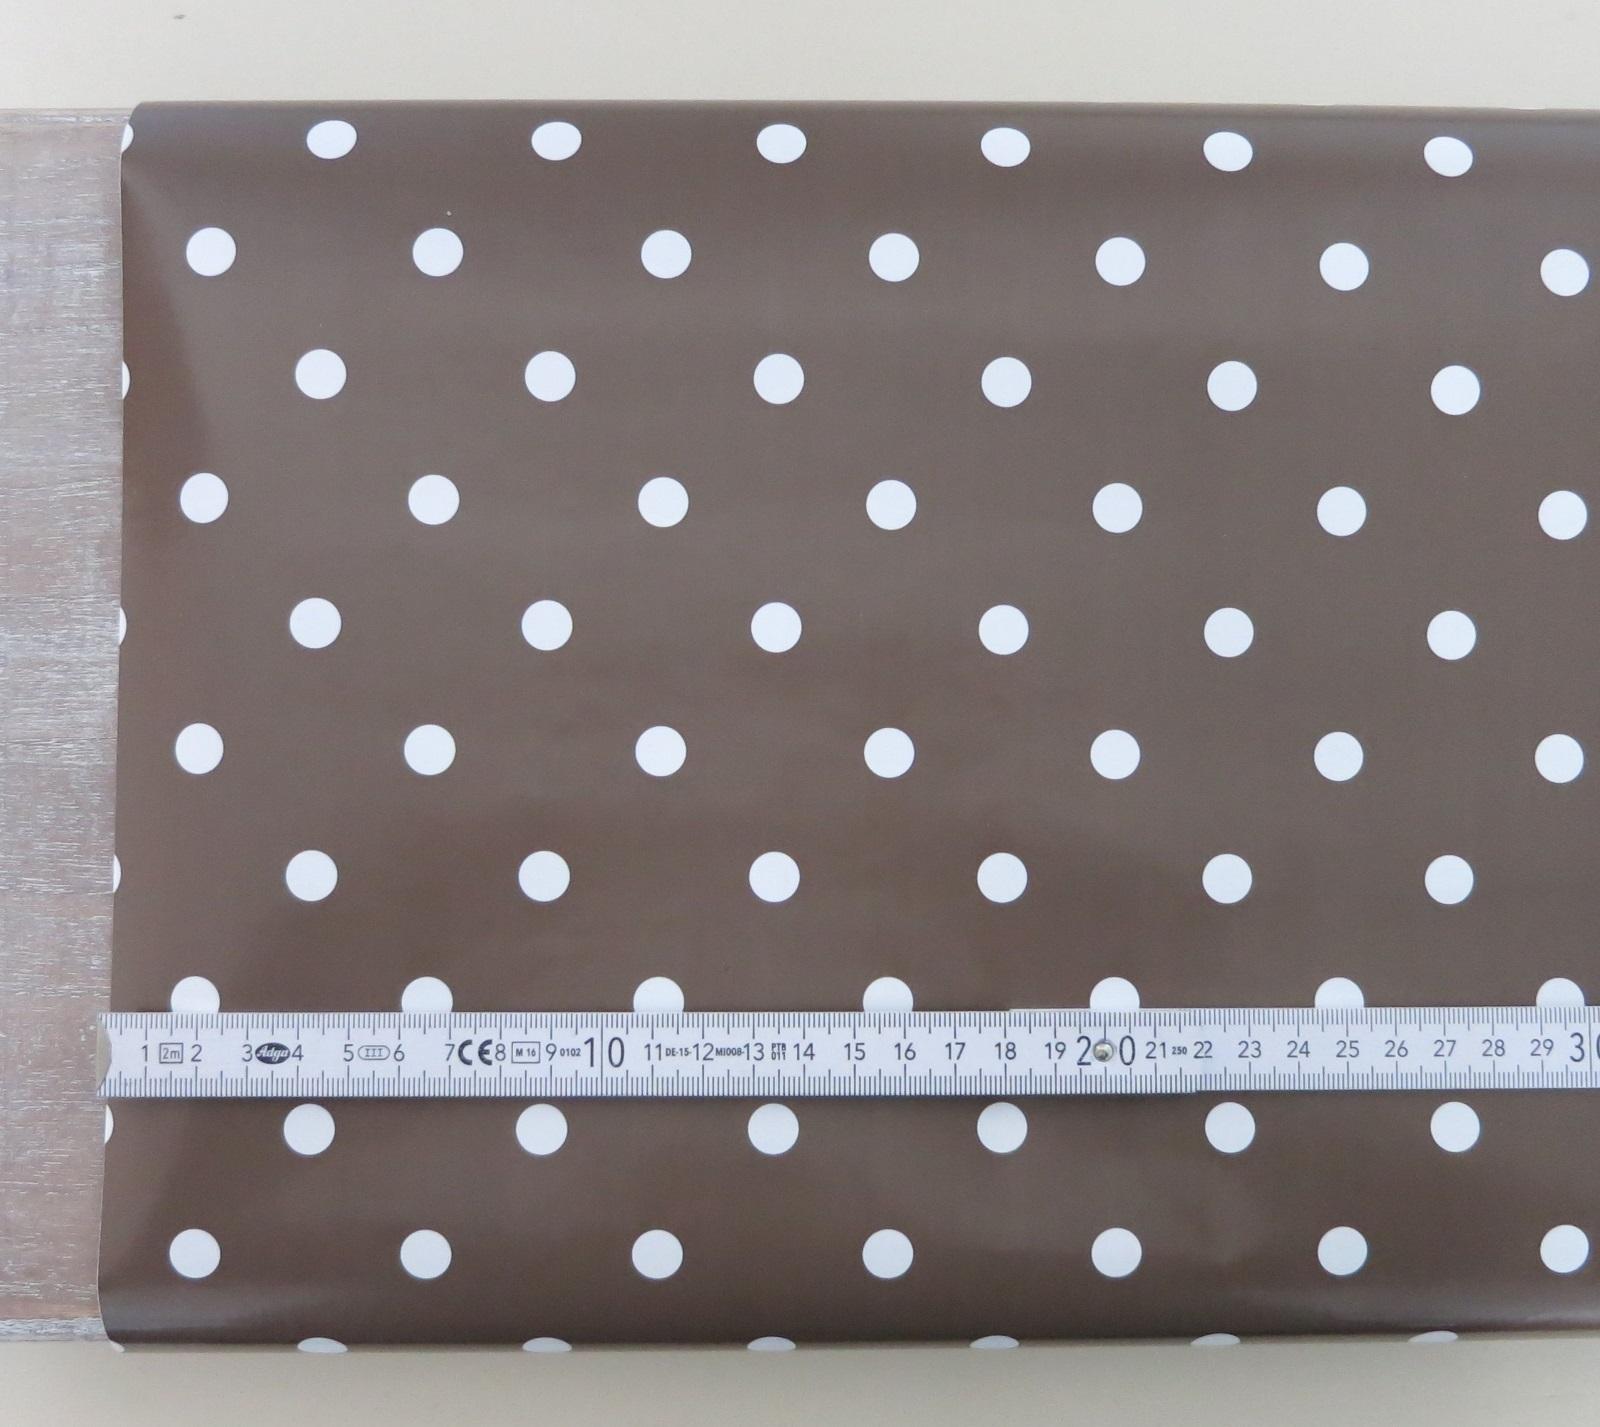 Klebefolie Möbel Julia Punkte bunt DOTS Möbelfolie selbstklebend 45 cm x 200 cm